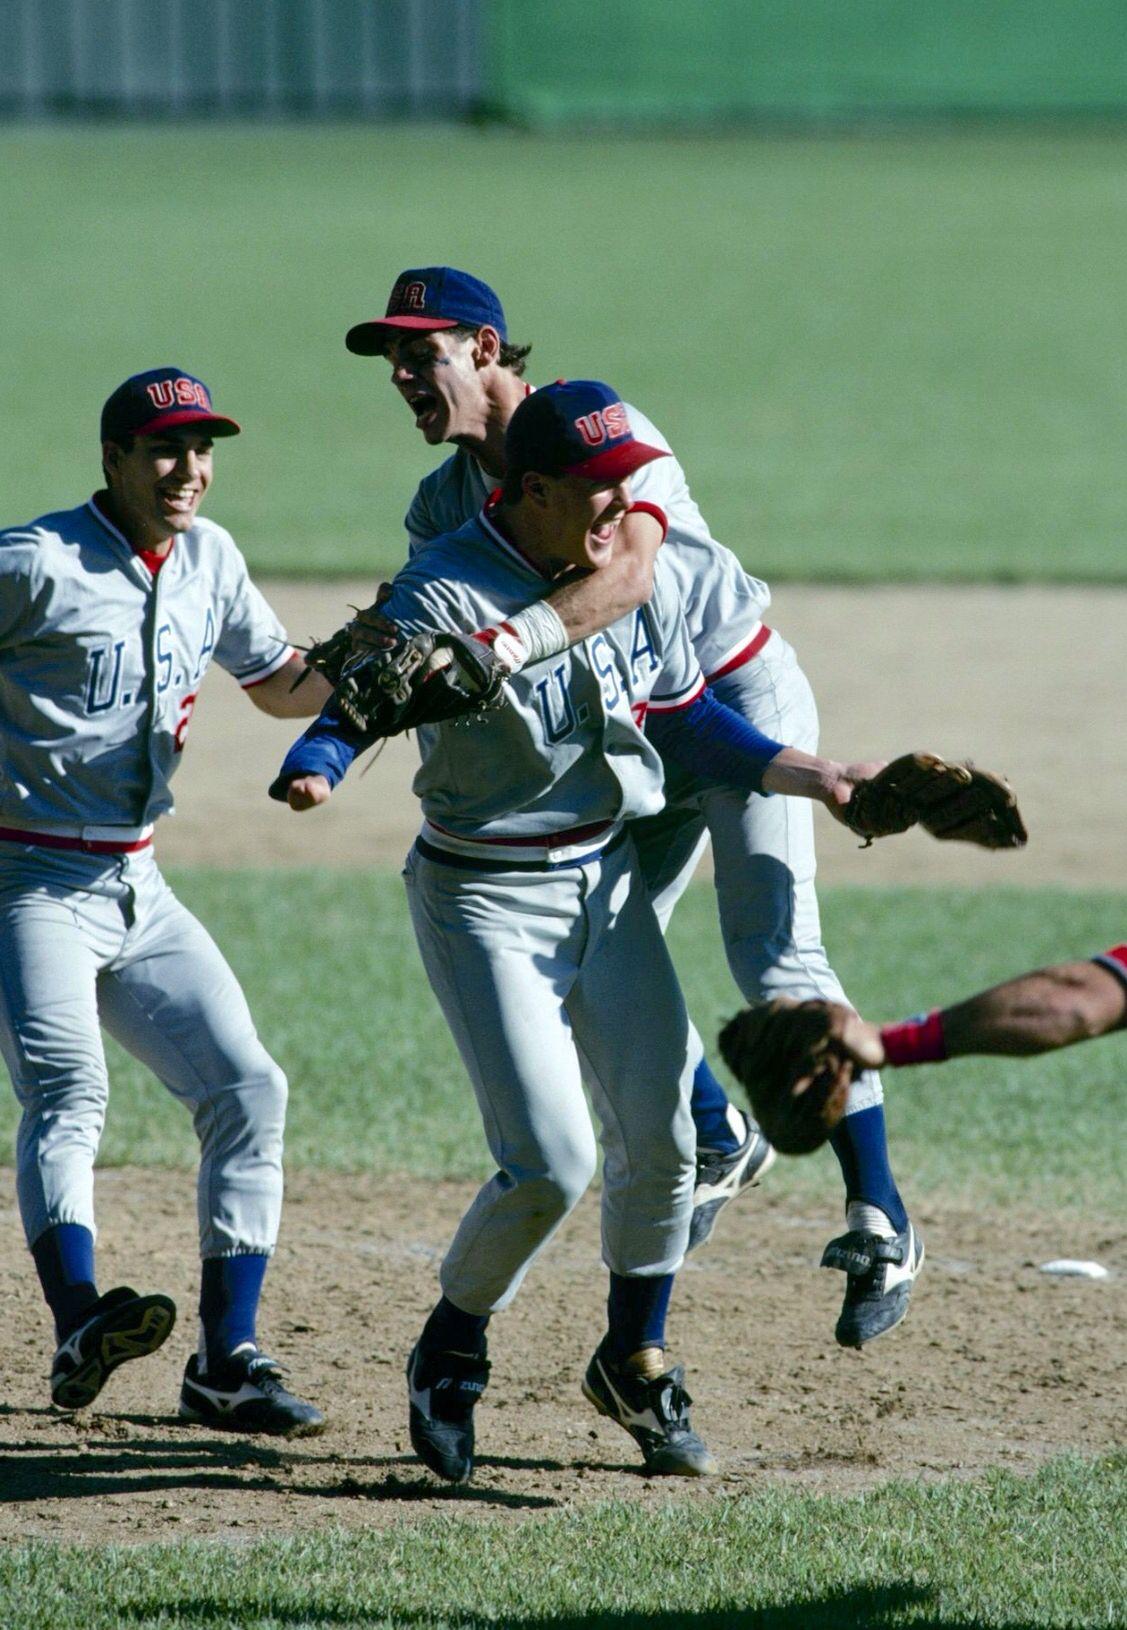 Jim Abbott 1988 Olympics Usa baseball, Baseball